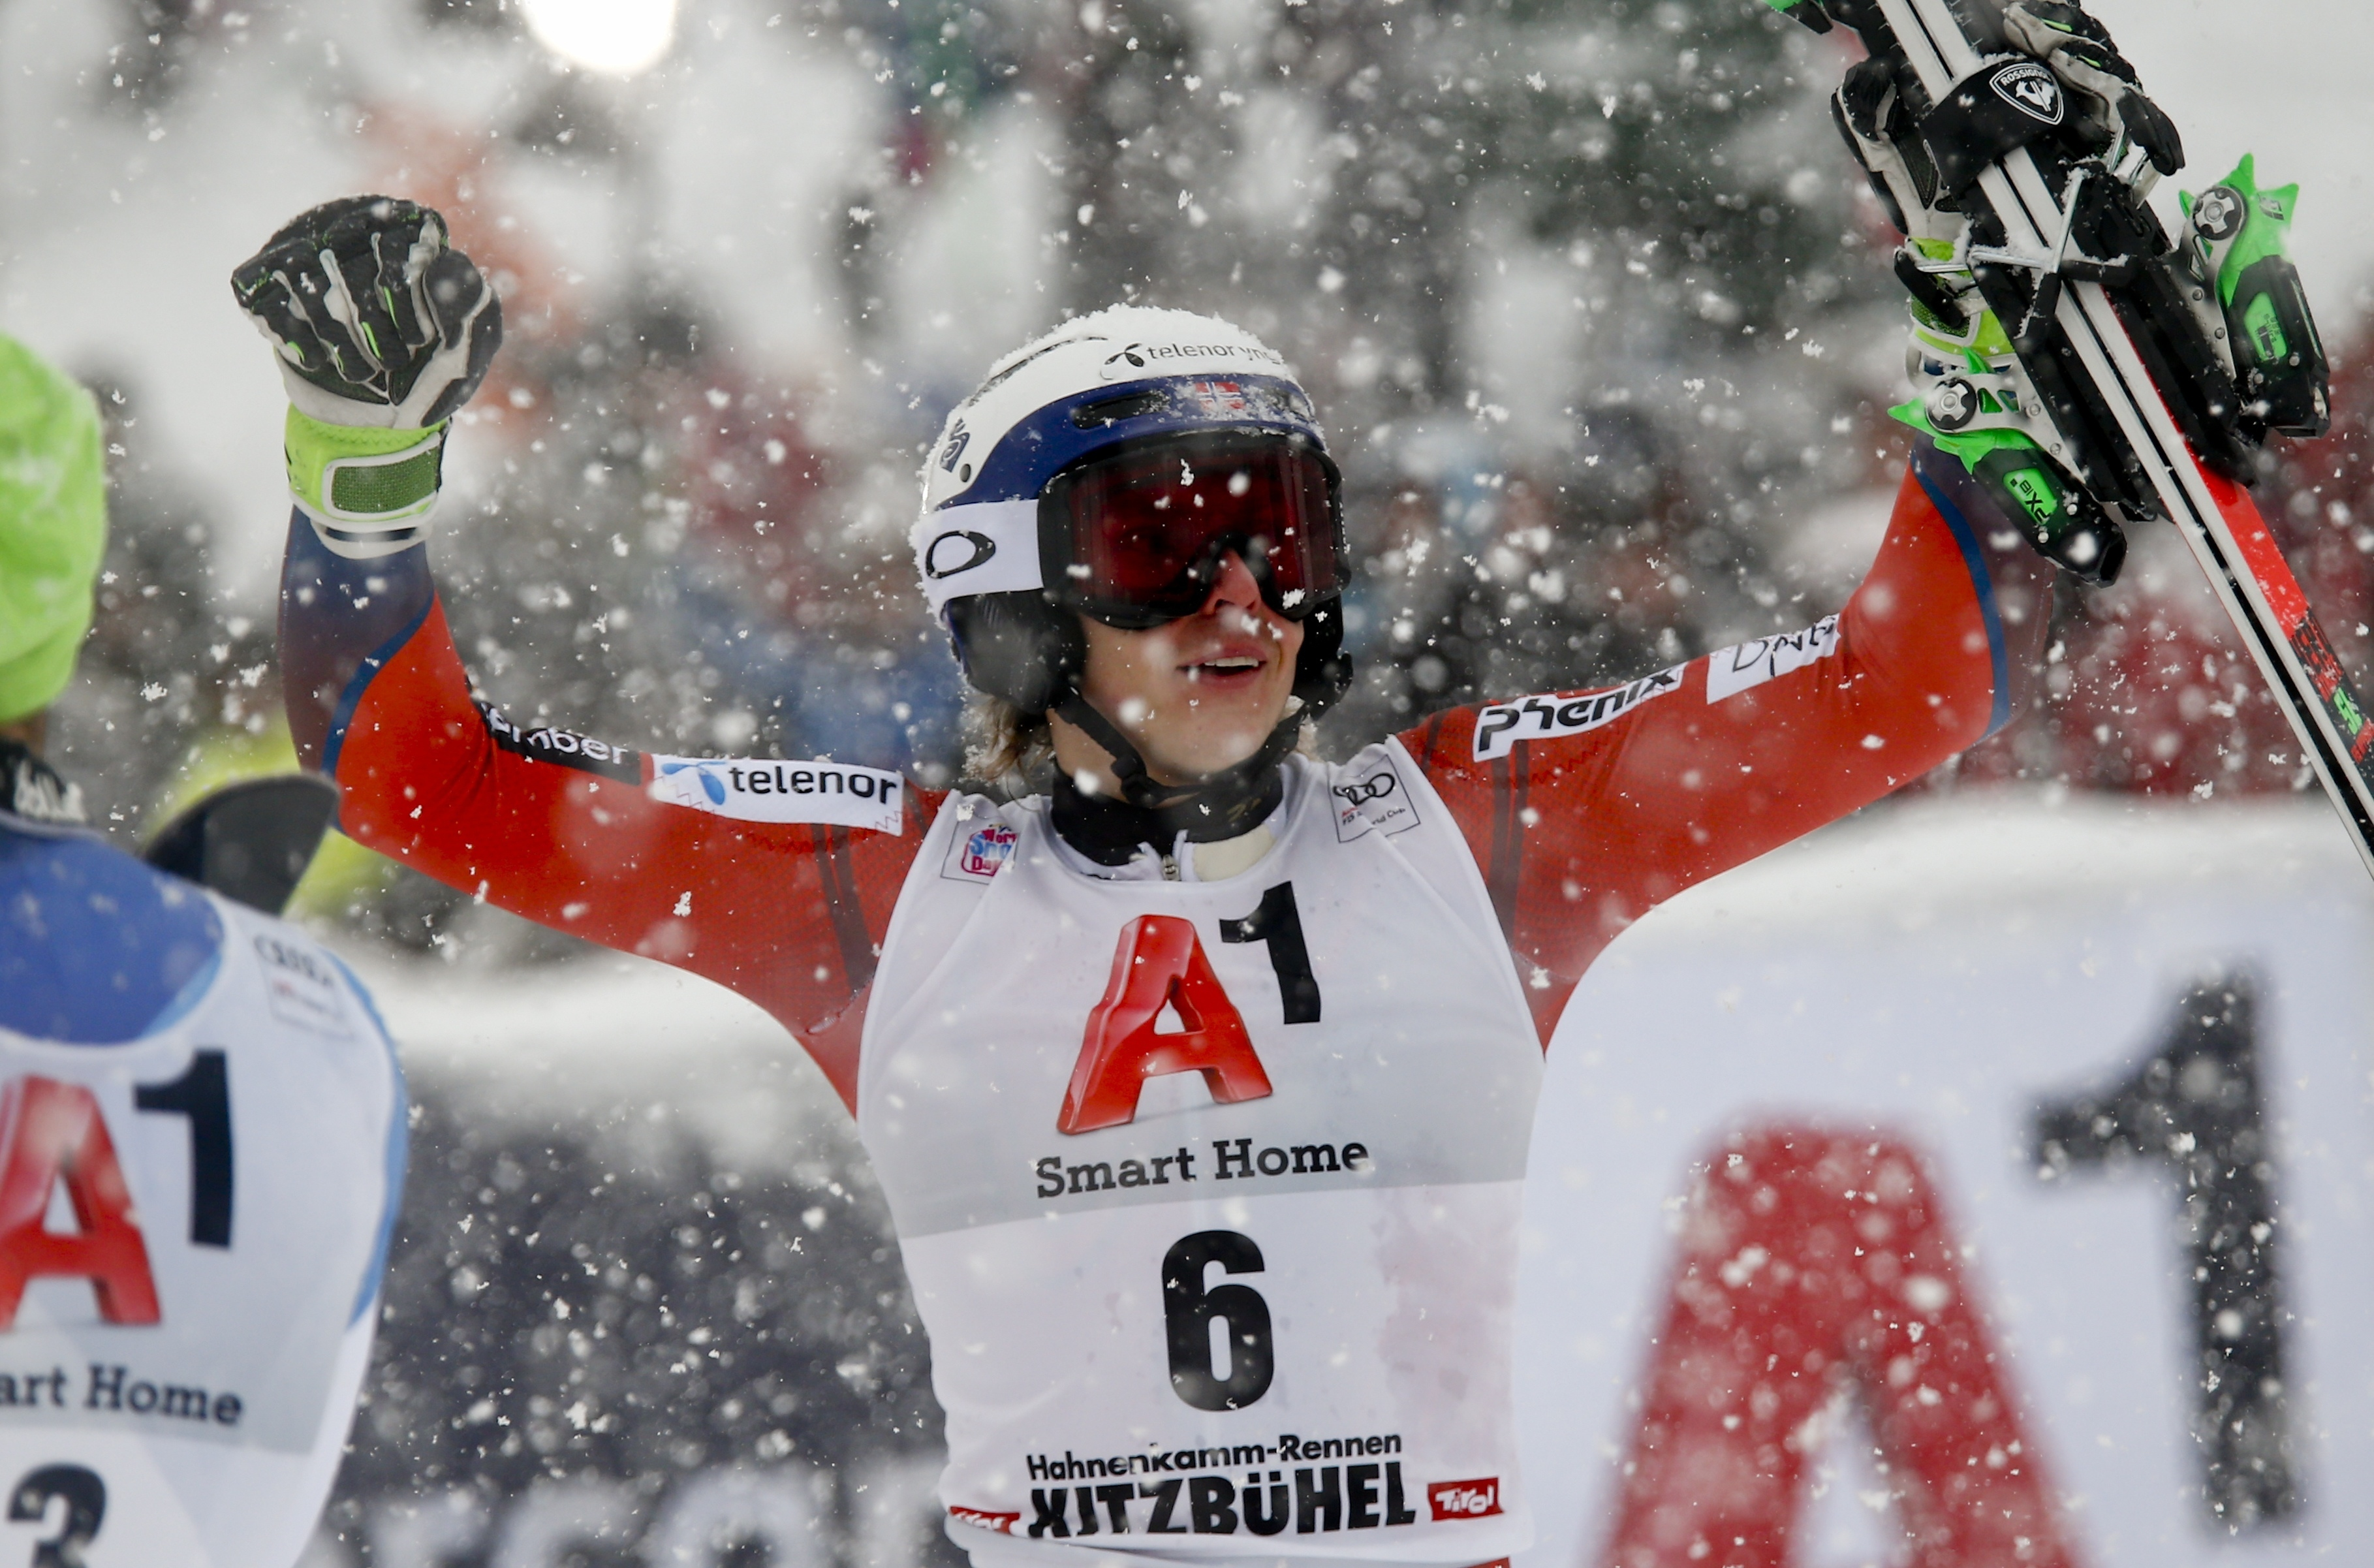 Sports d'hiver - Kristoffersen la tient enfin, Muffat-Jeandet confirme